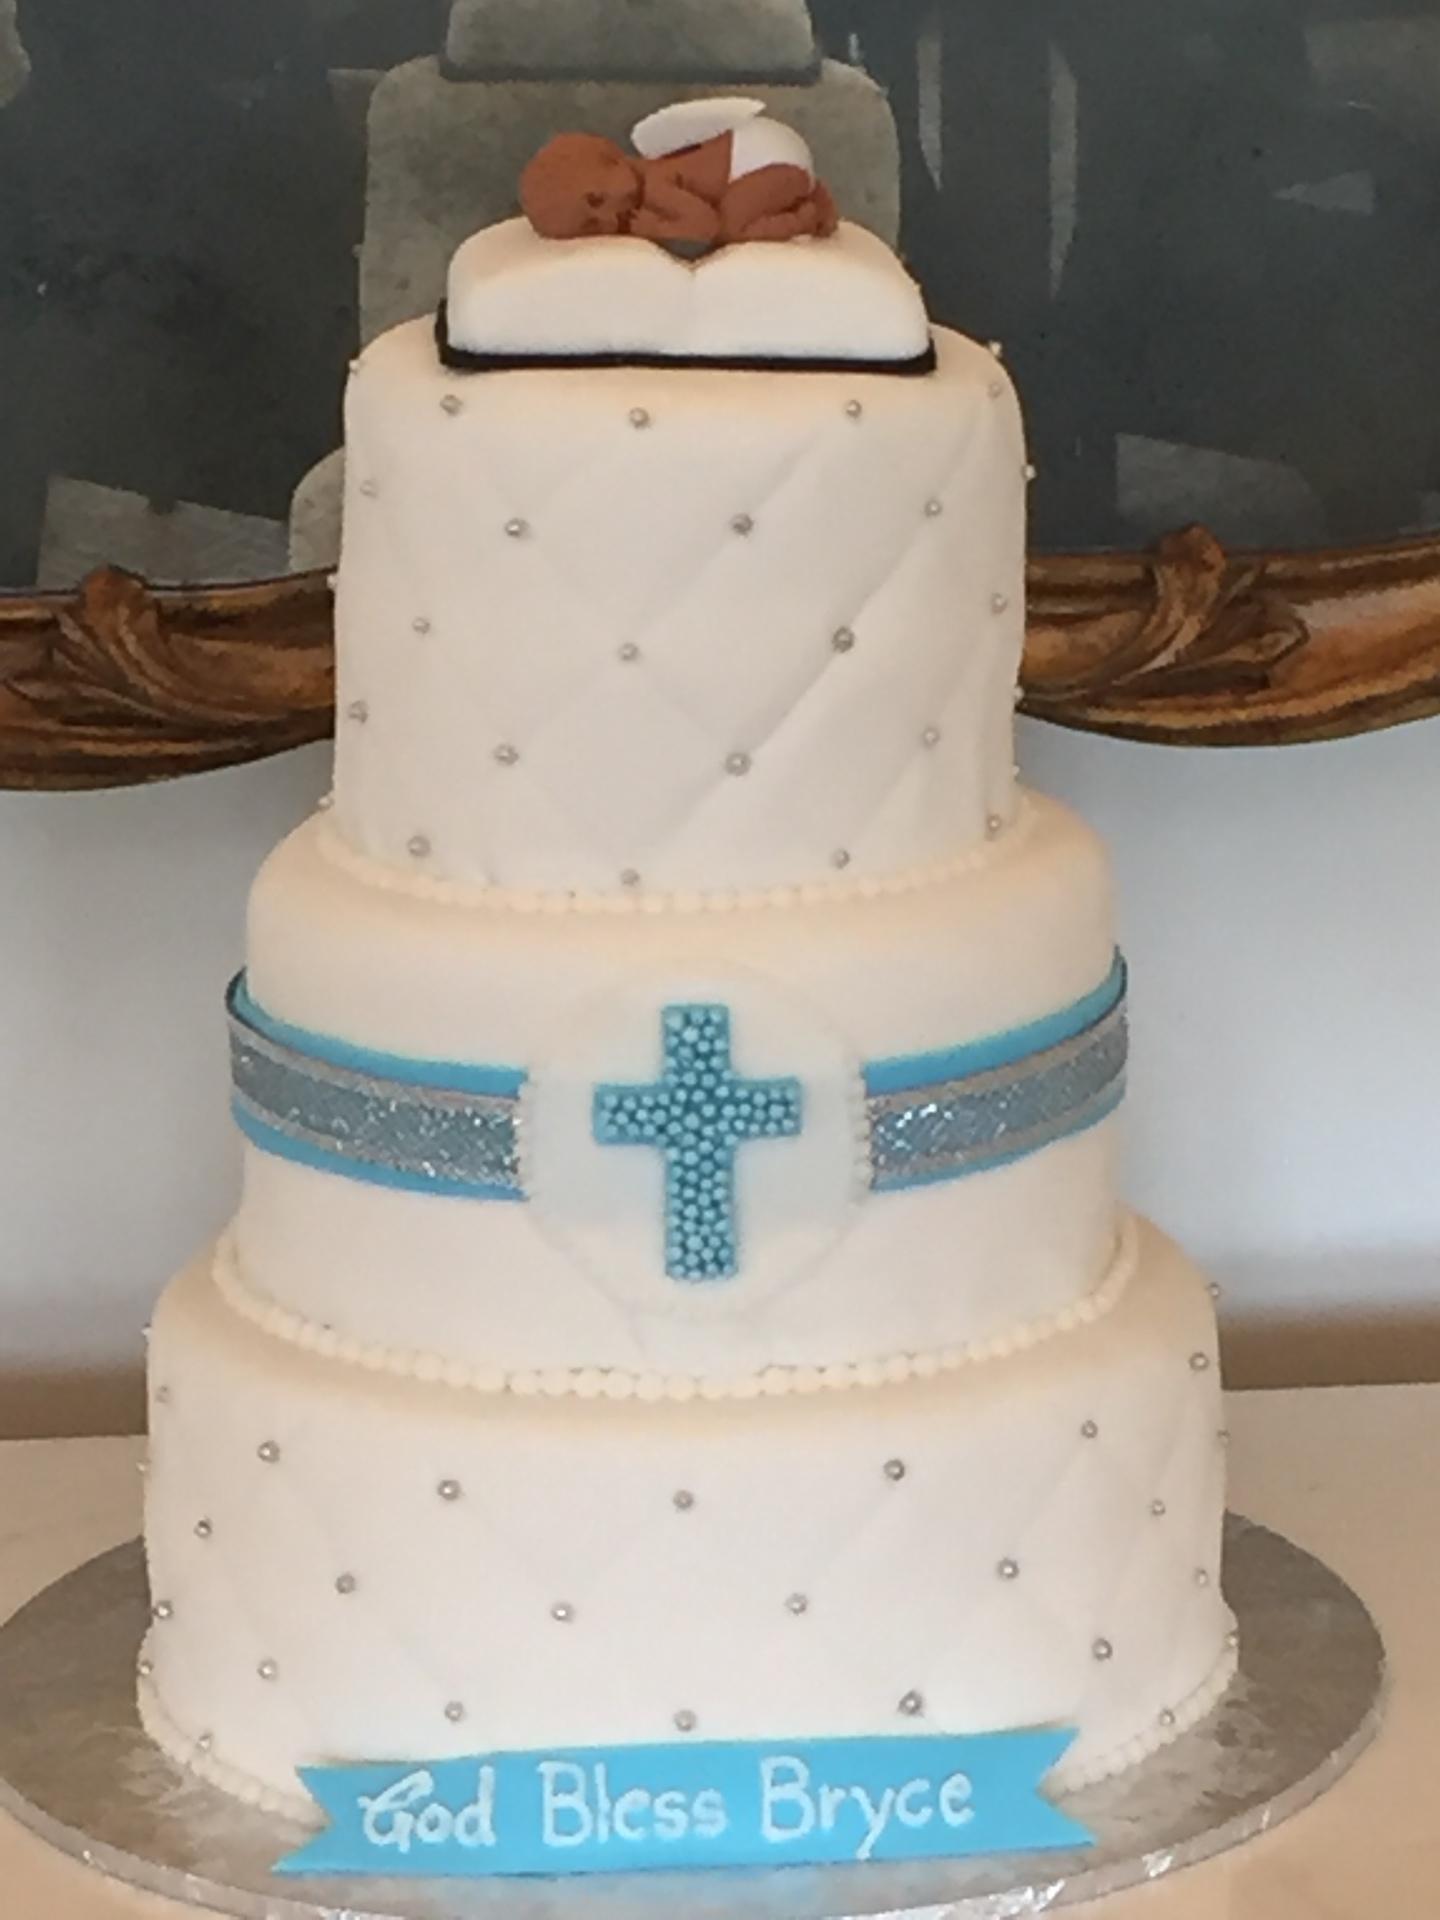 Christening cake, baptism cake, religious cake